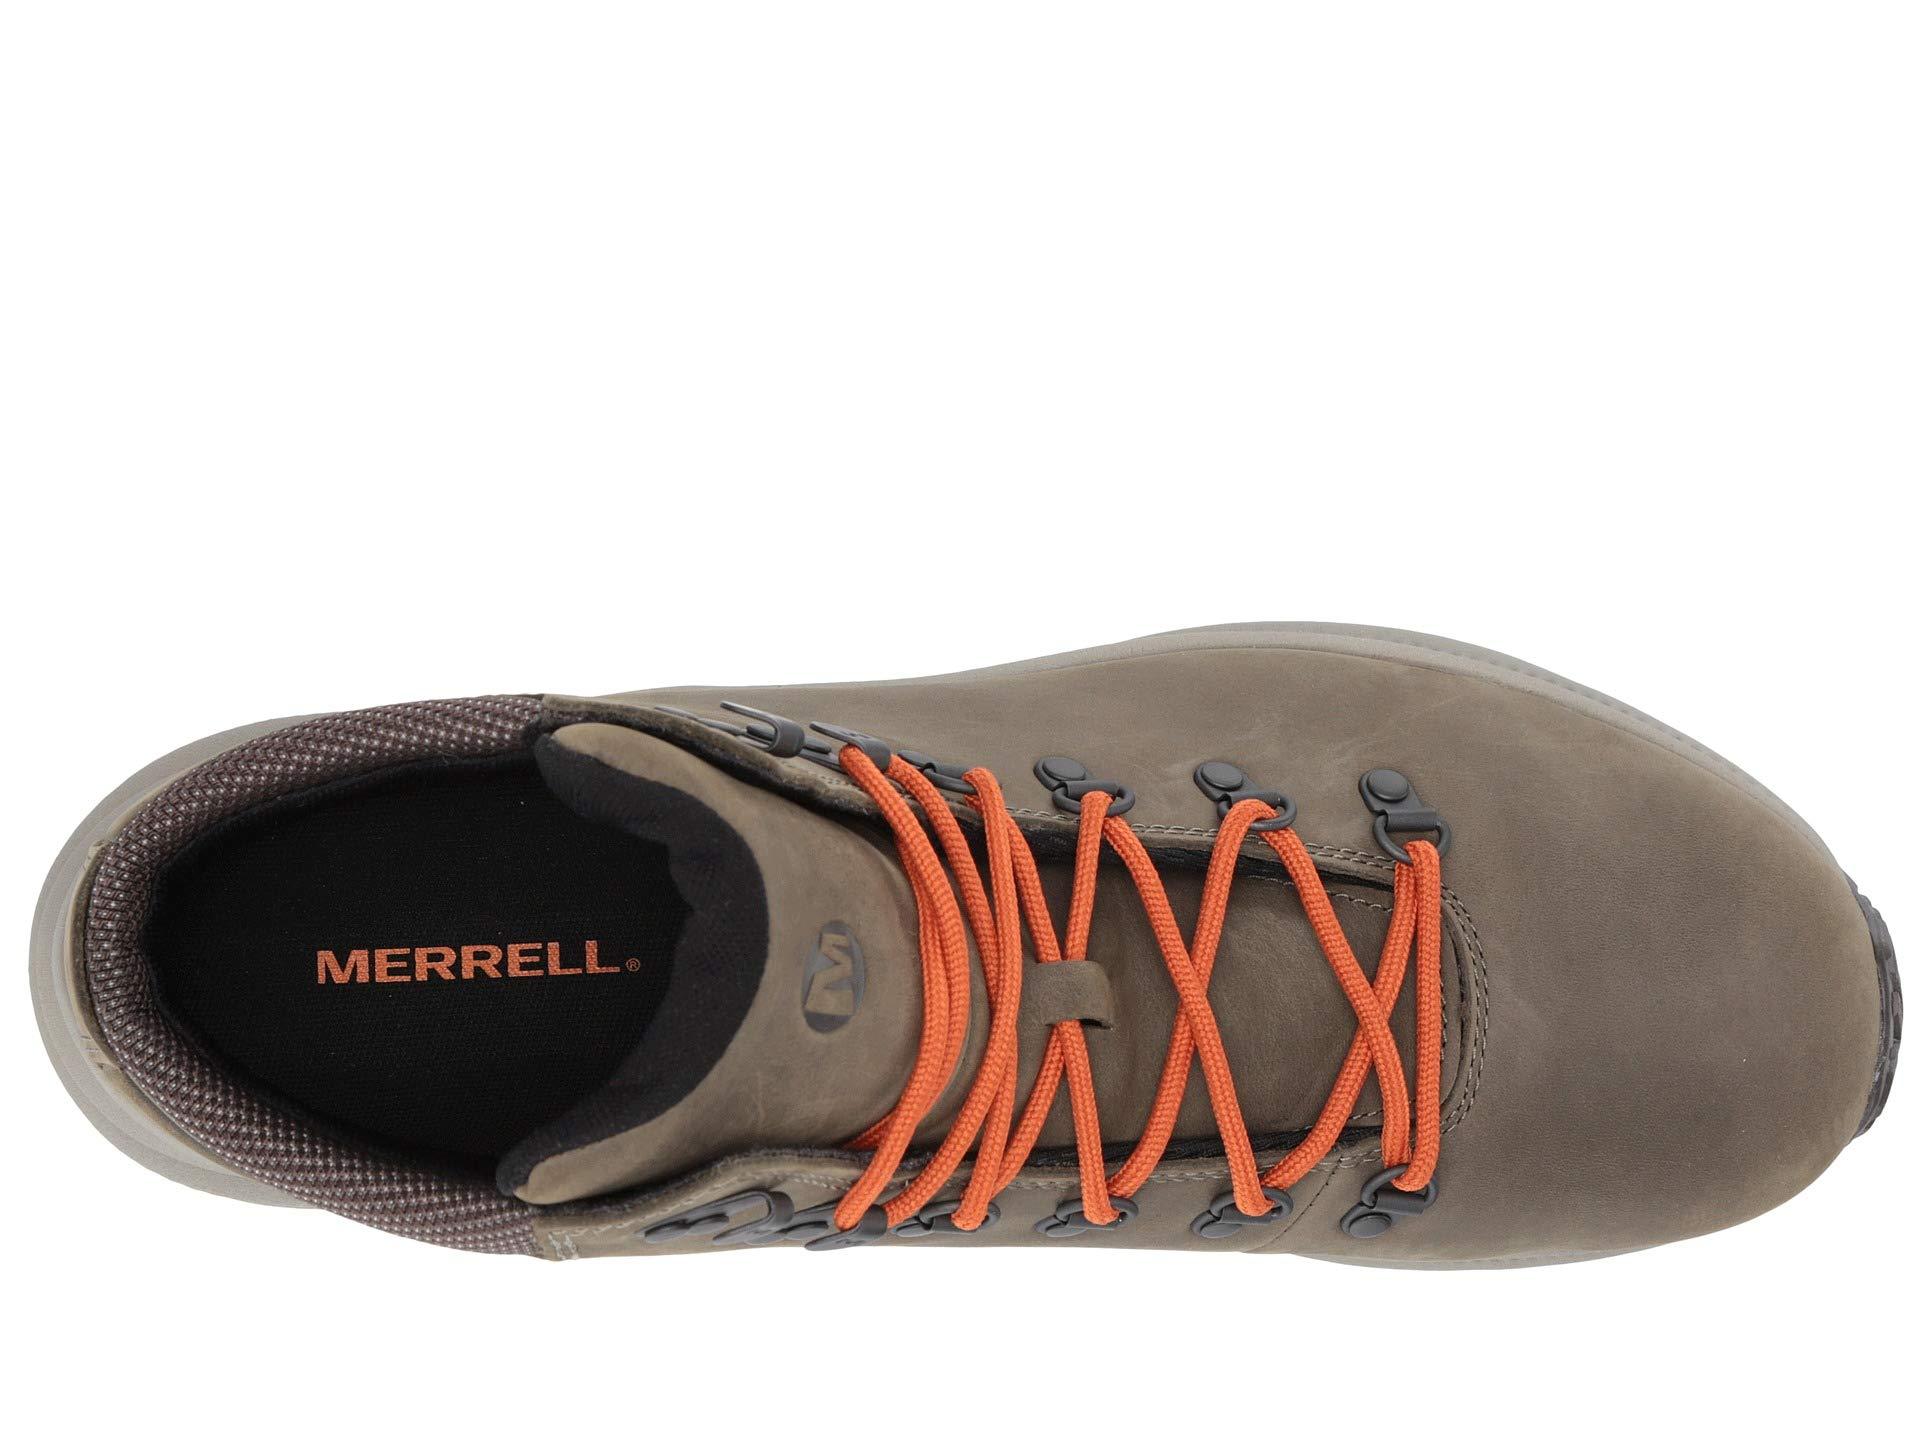 Mid Mid Olive Ontario Ontario Merrell Merrell Merrell Olive qpxCSwa6E